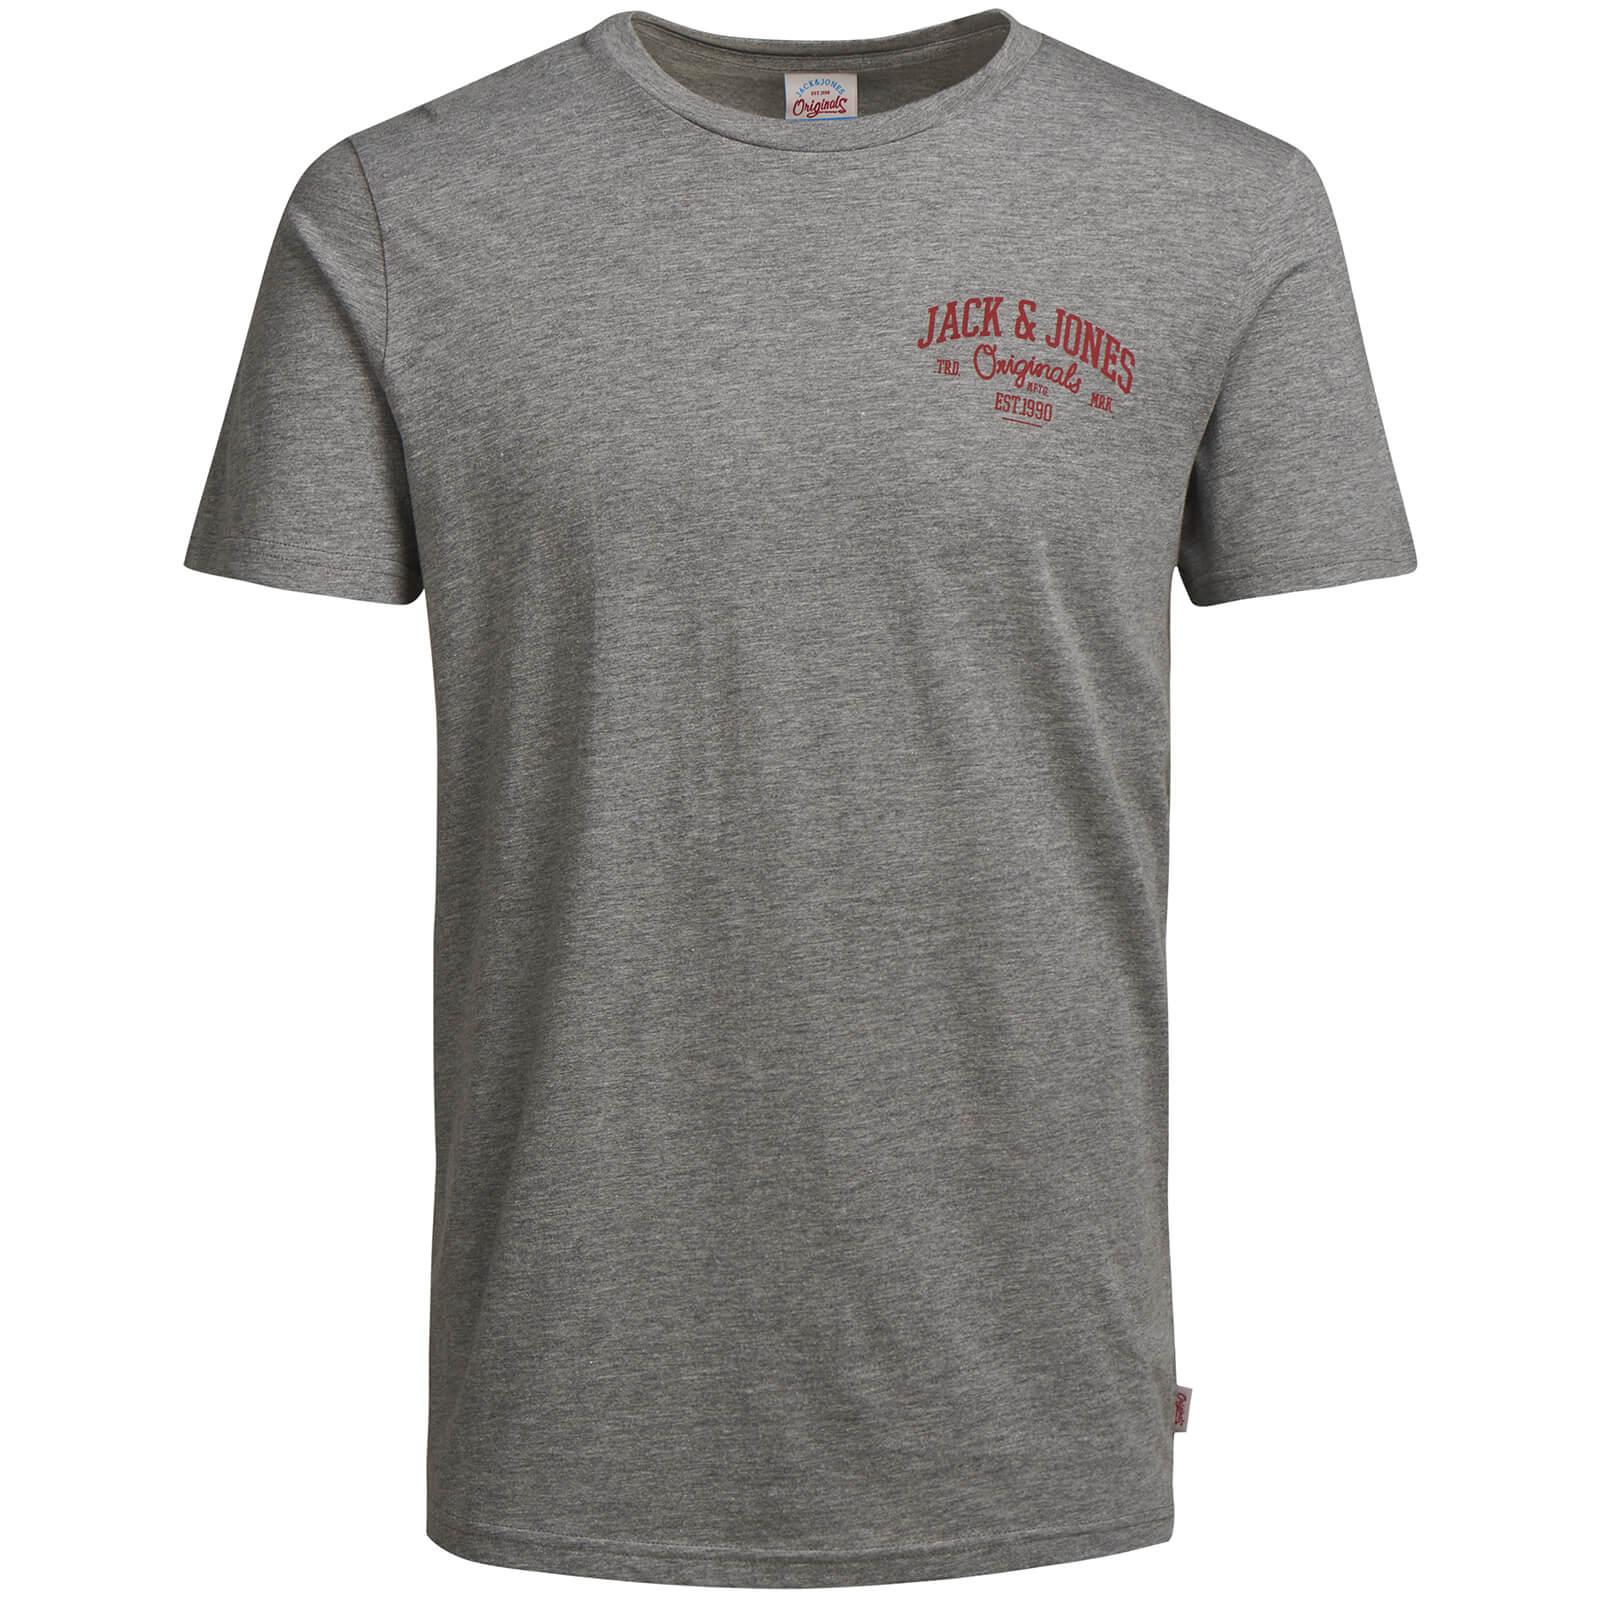 Camiseta Jack and Jones talla S